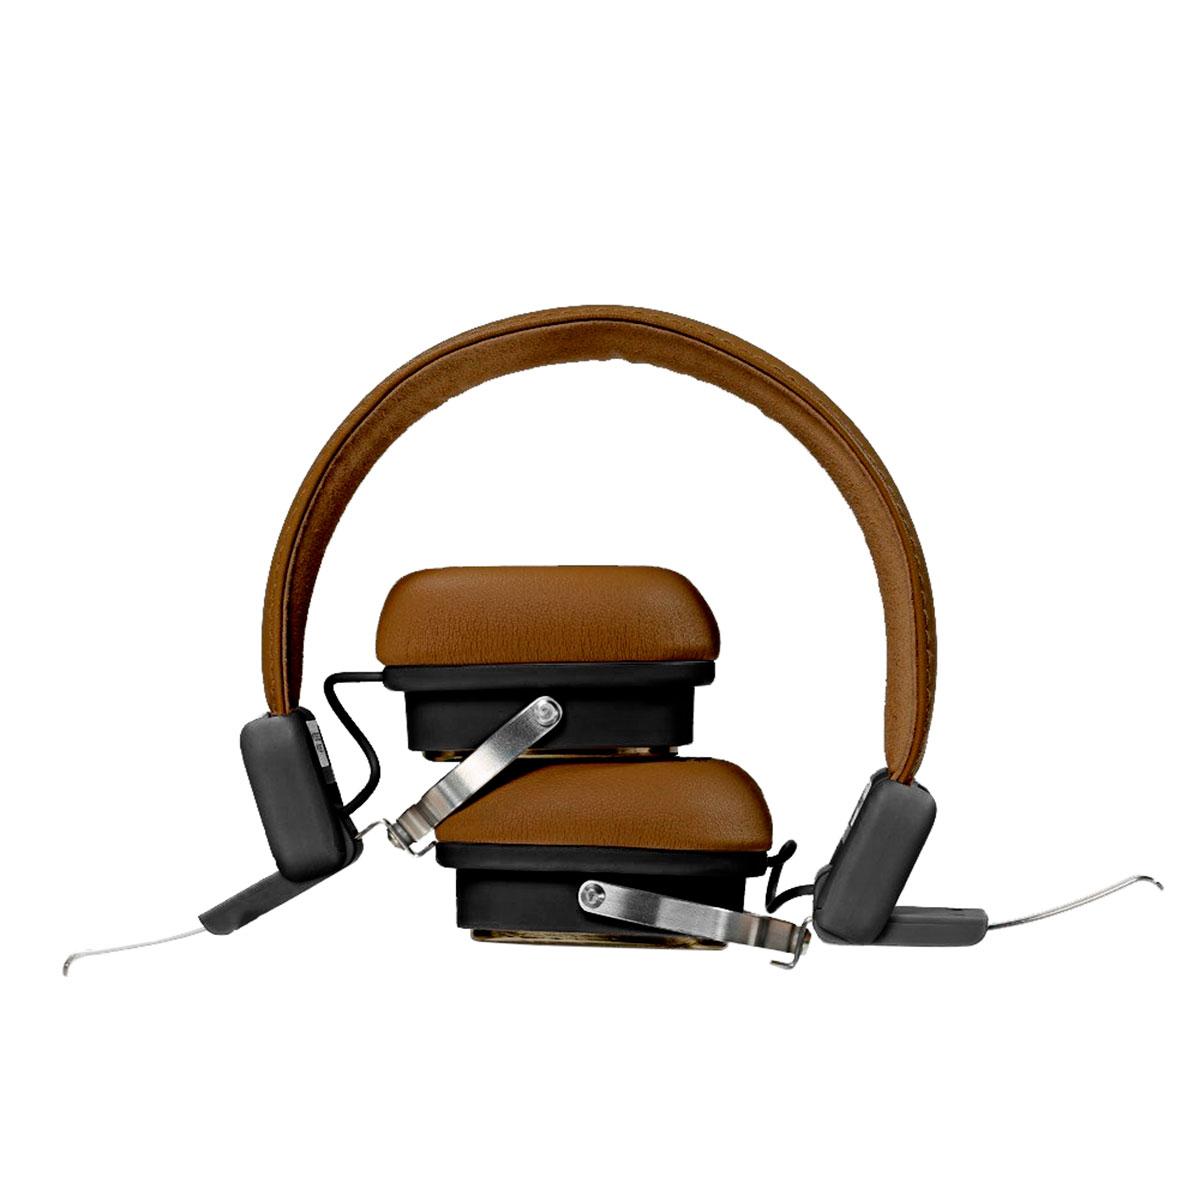 Fone Bluetooth C3Tech PH-B600BW, Marrom